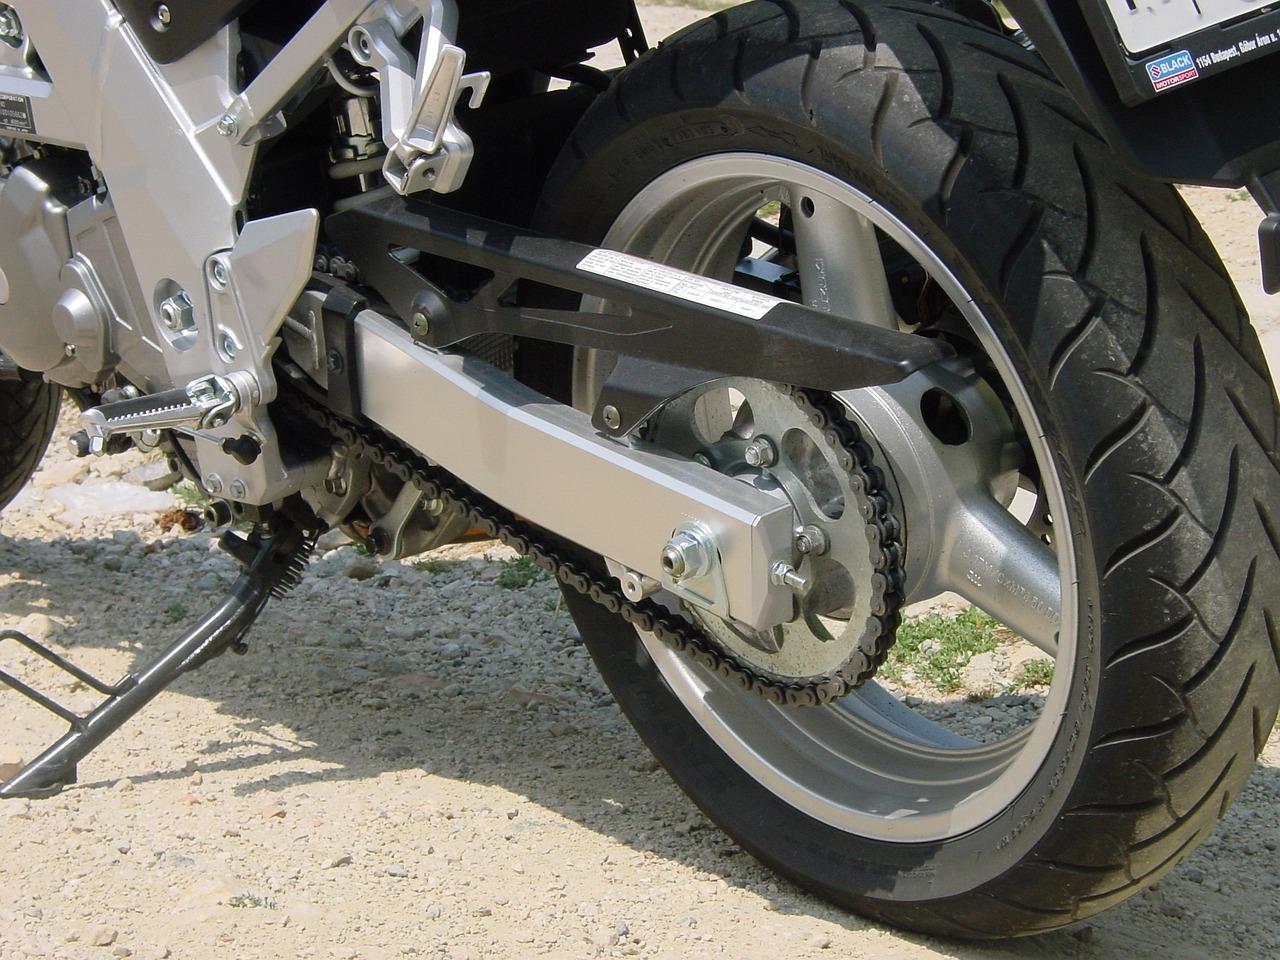 Suzuki Motorcycle Wheel - Free photo on Pixabay